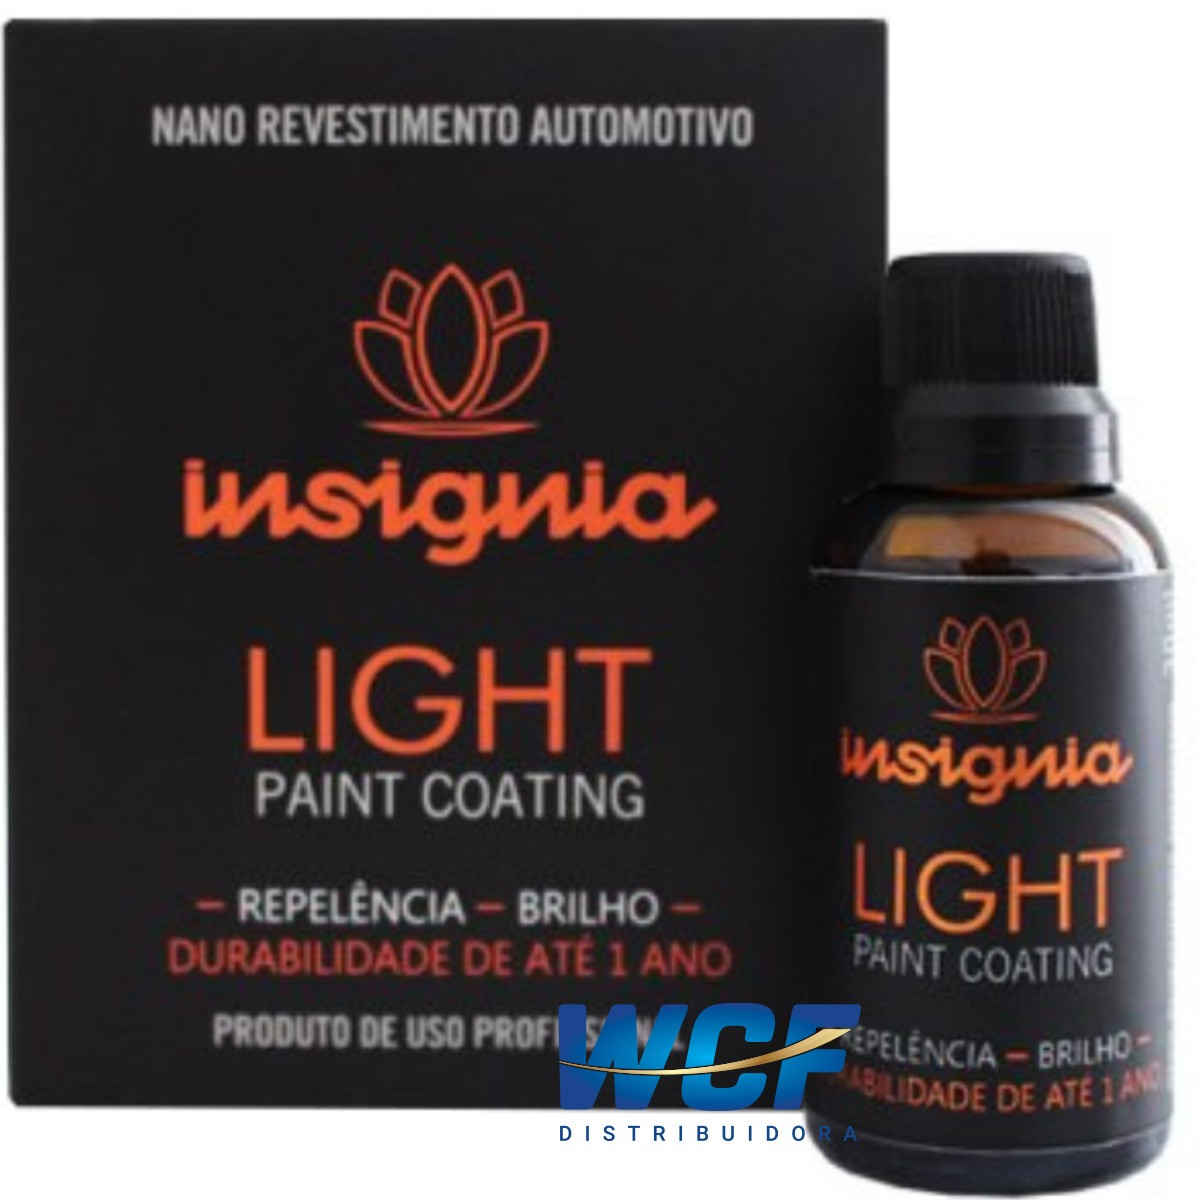 EASYTECH INSIGNIA LIGHT 30 ML